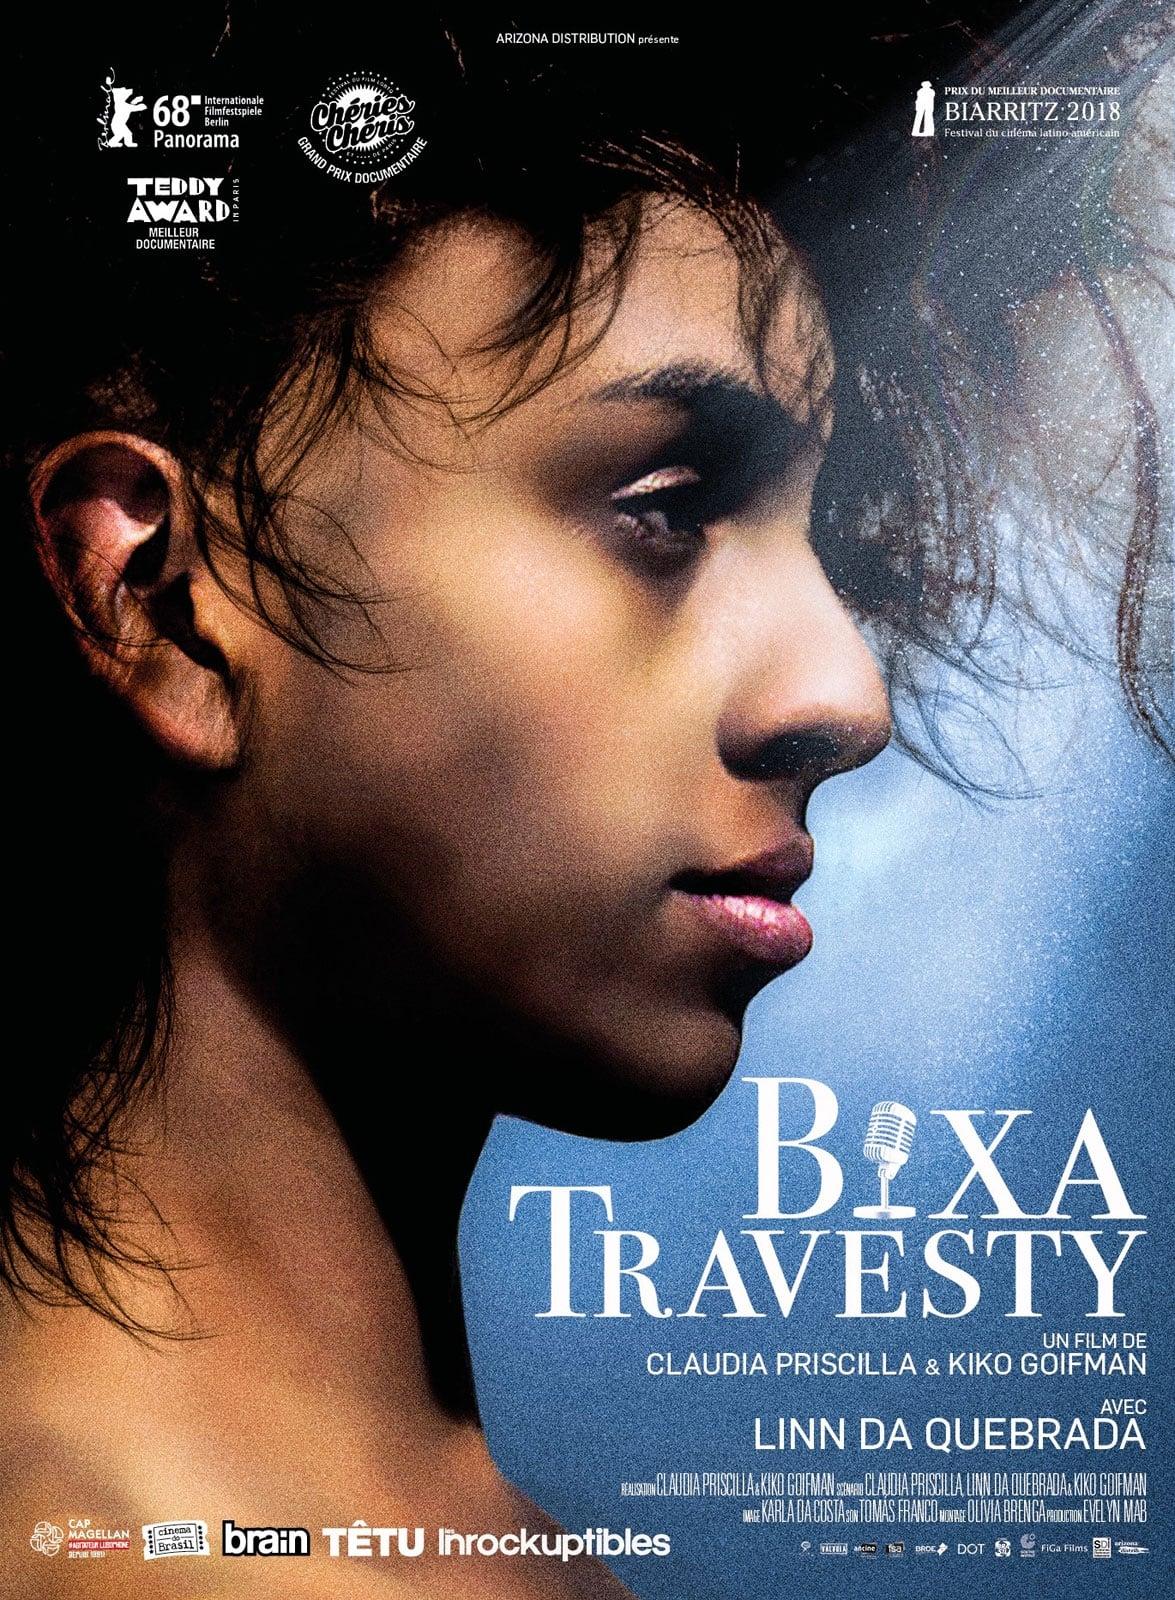 Bixa Travesty streaming sur zone telechargement